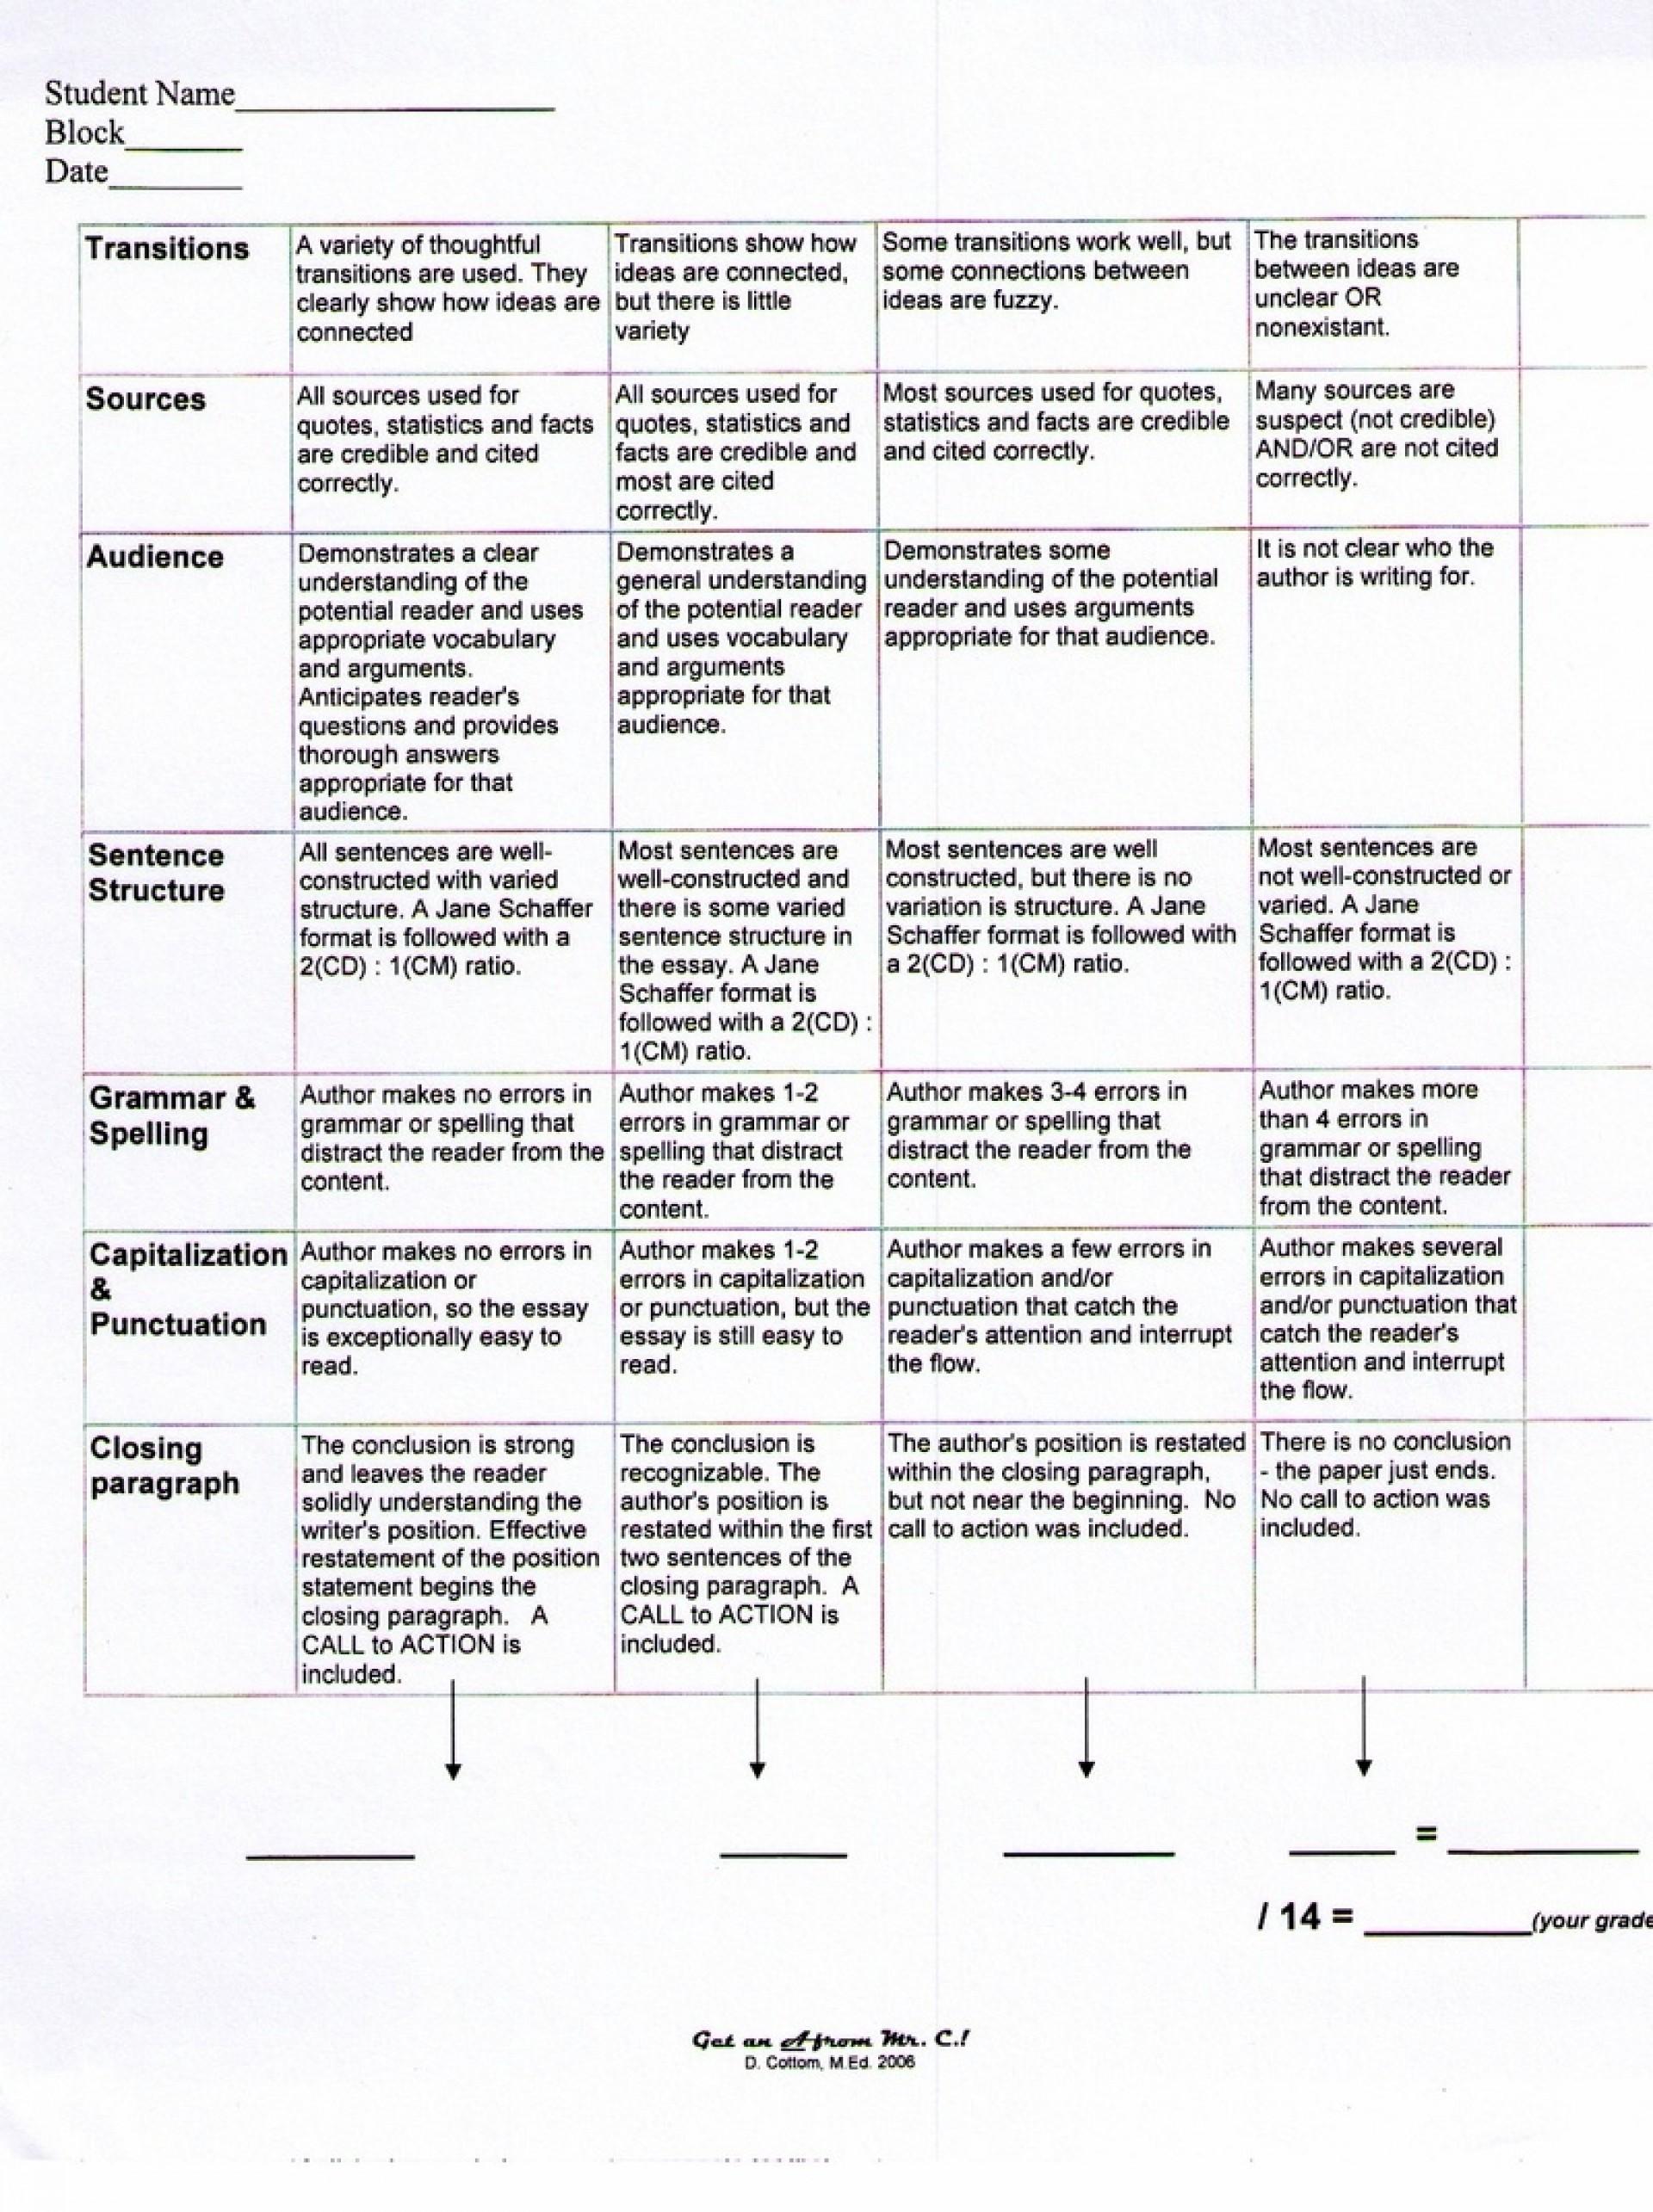 014 Persuasive20essay20rubric20pg2cbu003d Persuasive Essay Rubric Stunning Argumentative Grade 10 8th Doc Middle School Pdf 1920